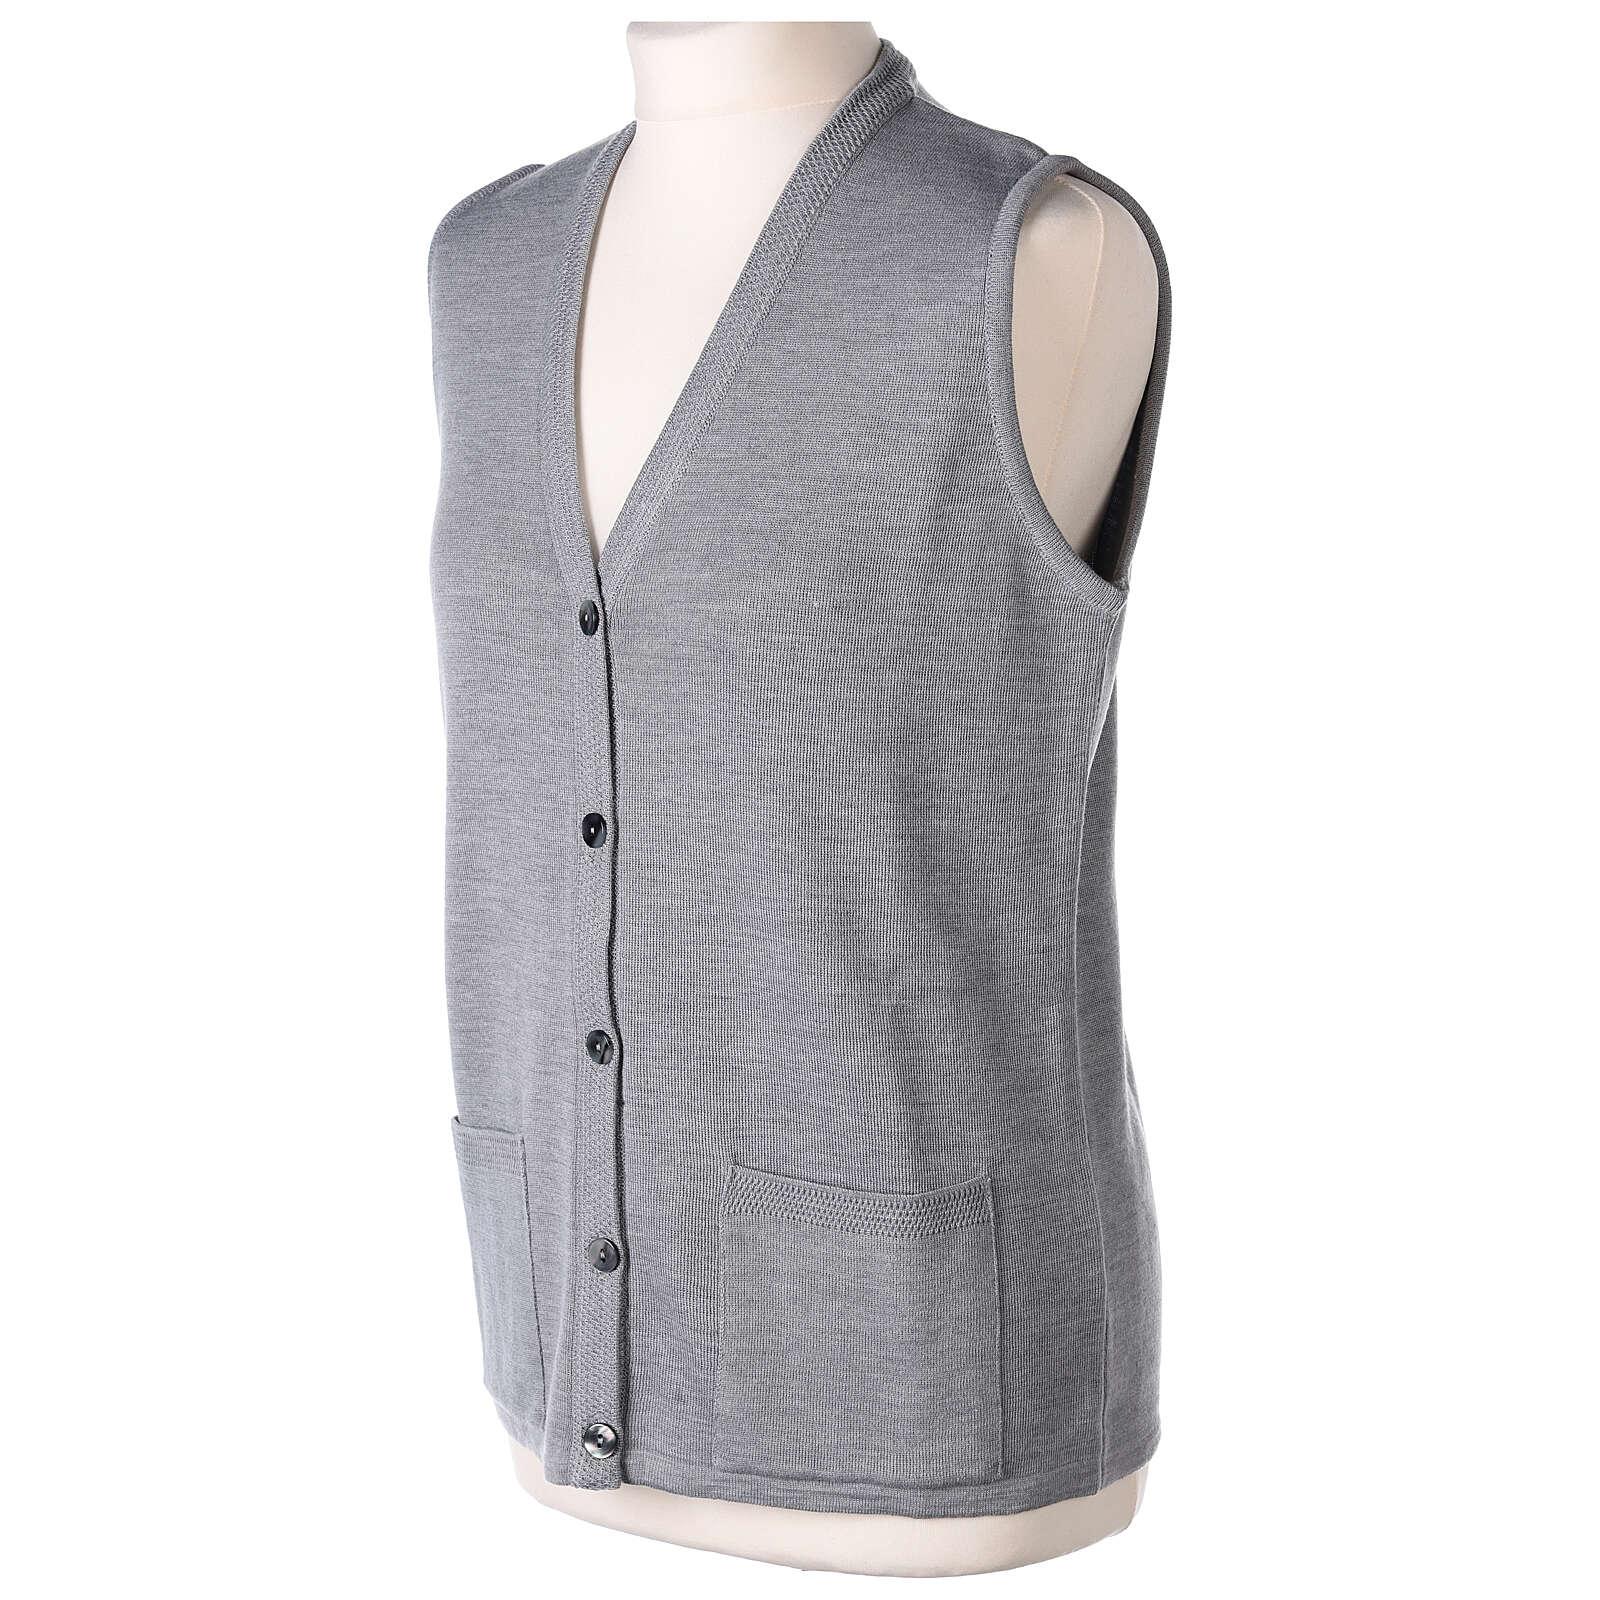 Grey V-neck sleeveless nun cardigan with pockets 50% acrylic 50% merino wool In Primis 4